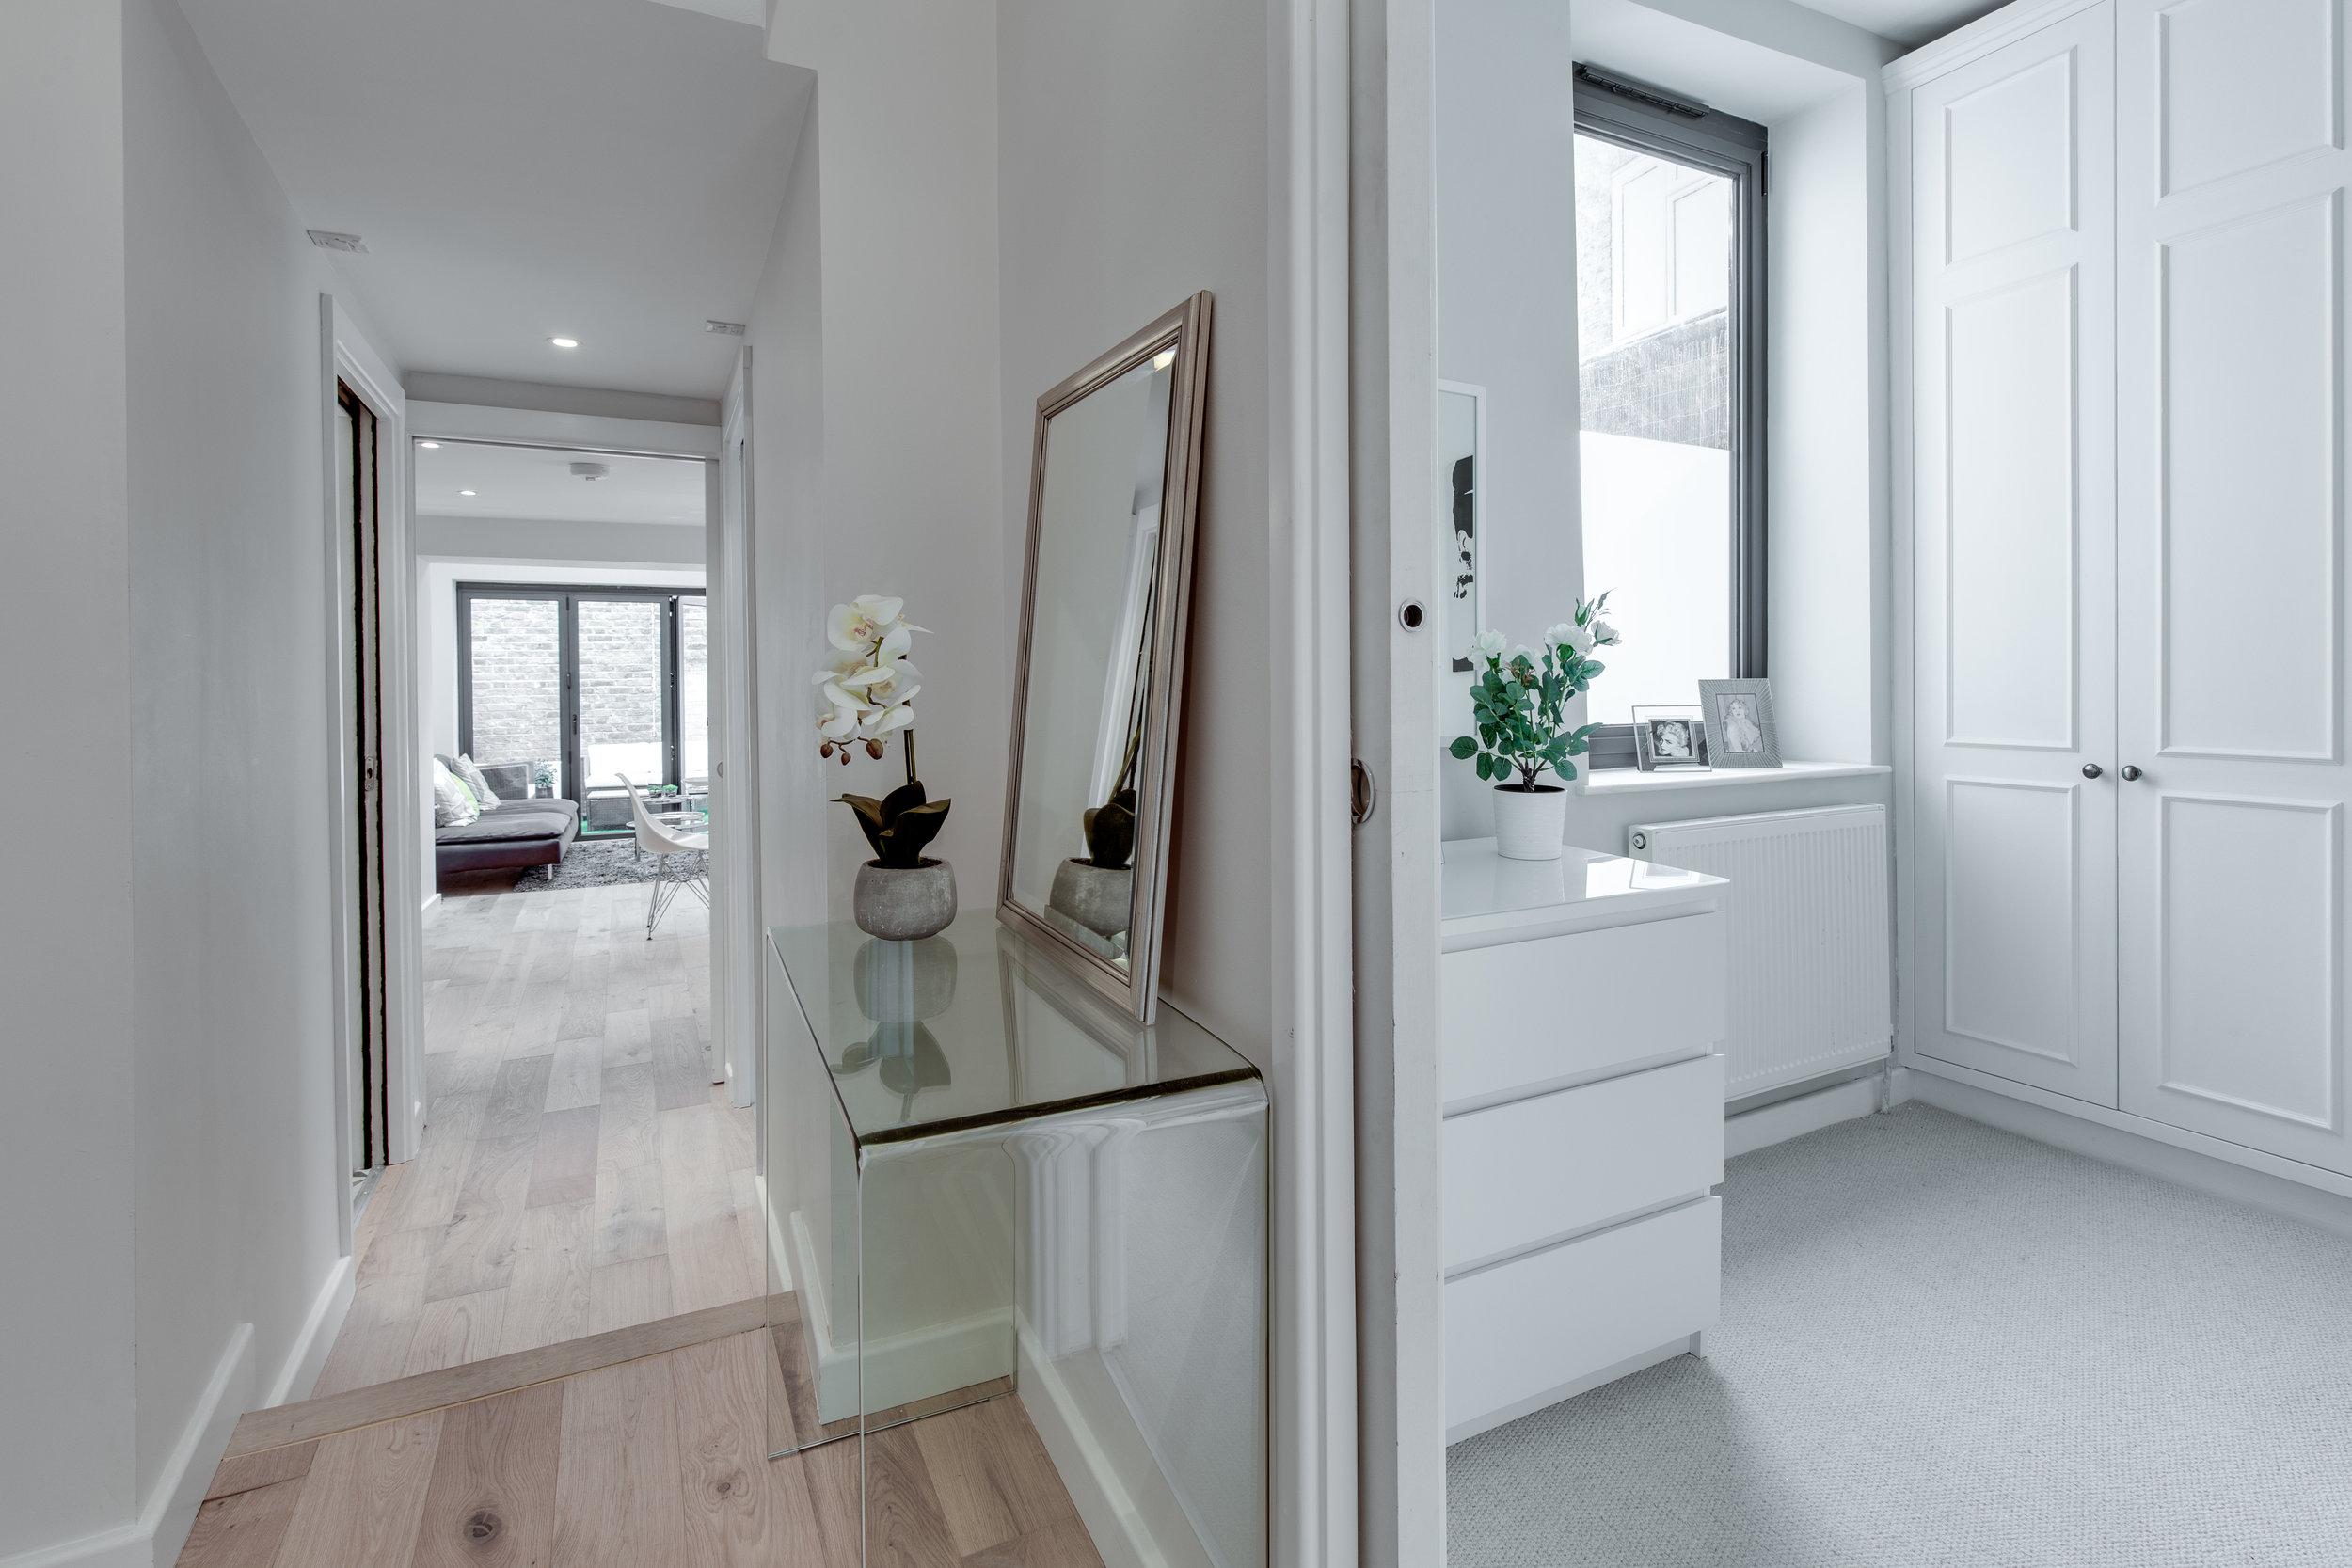 Landor Road    Location: Clapham North   Floor Area: 110m2 sqm   Budget: £200,000   Client: Lowe Properties   View More